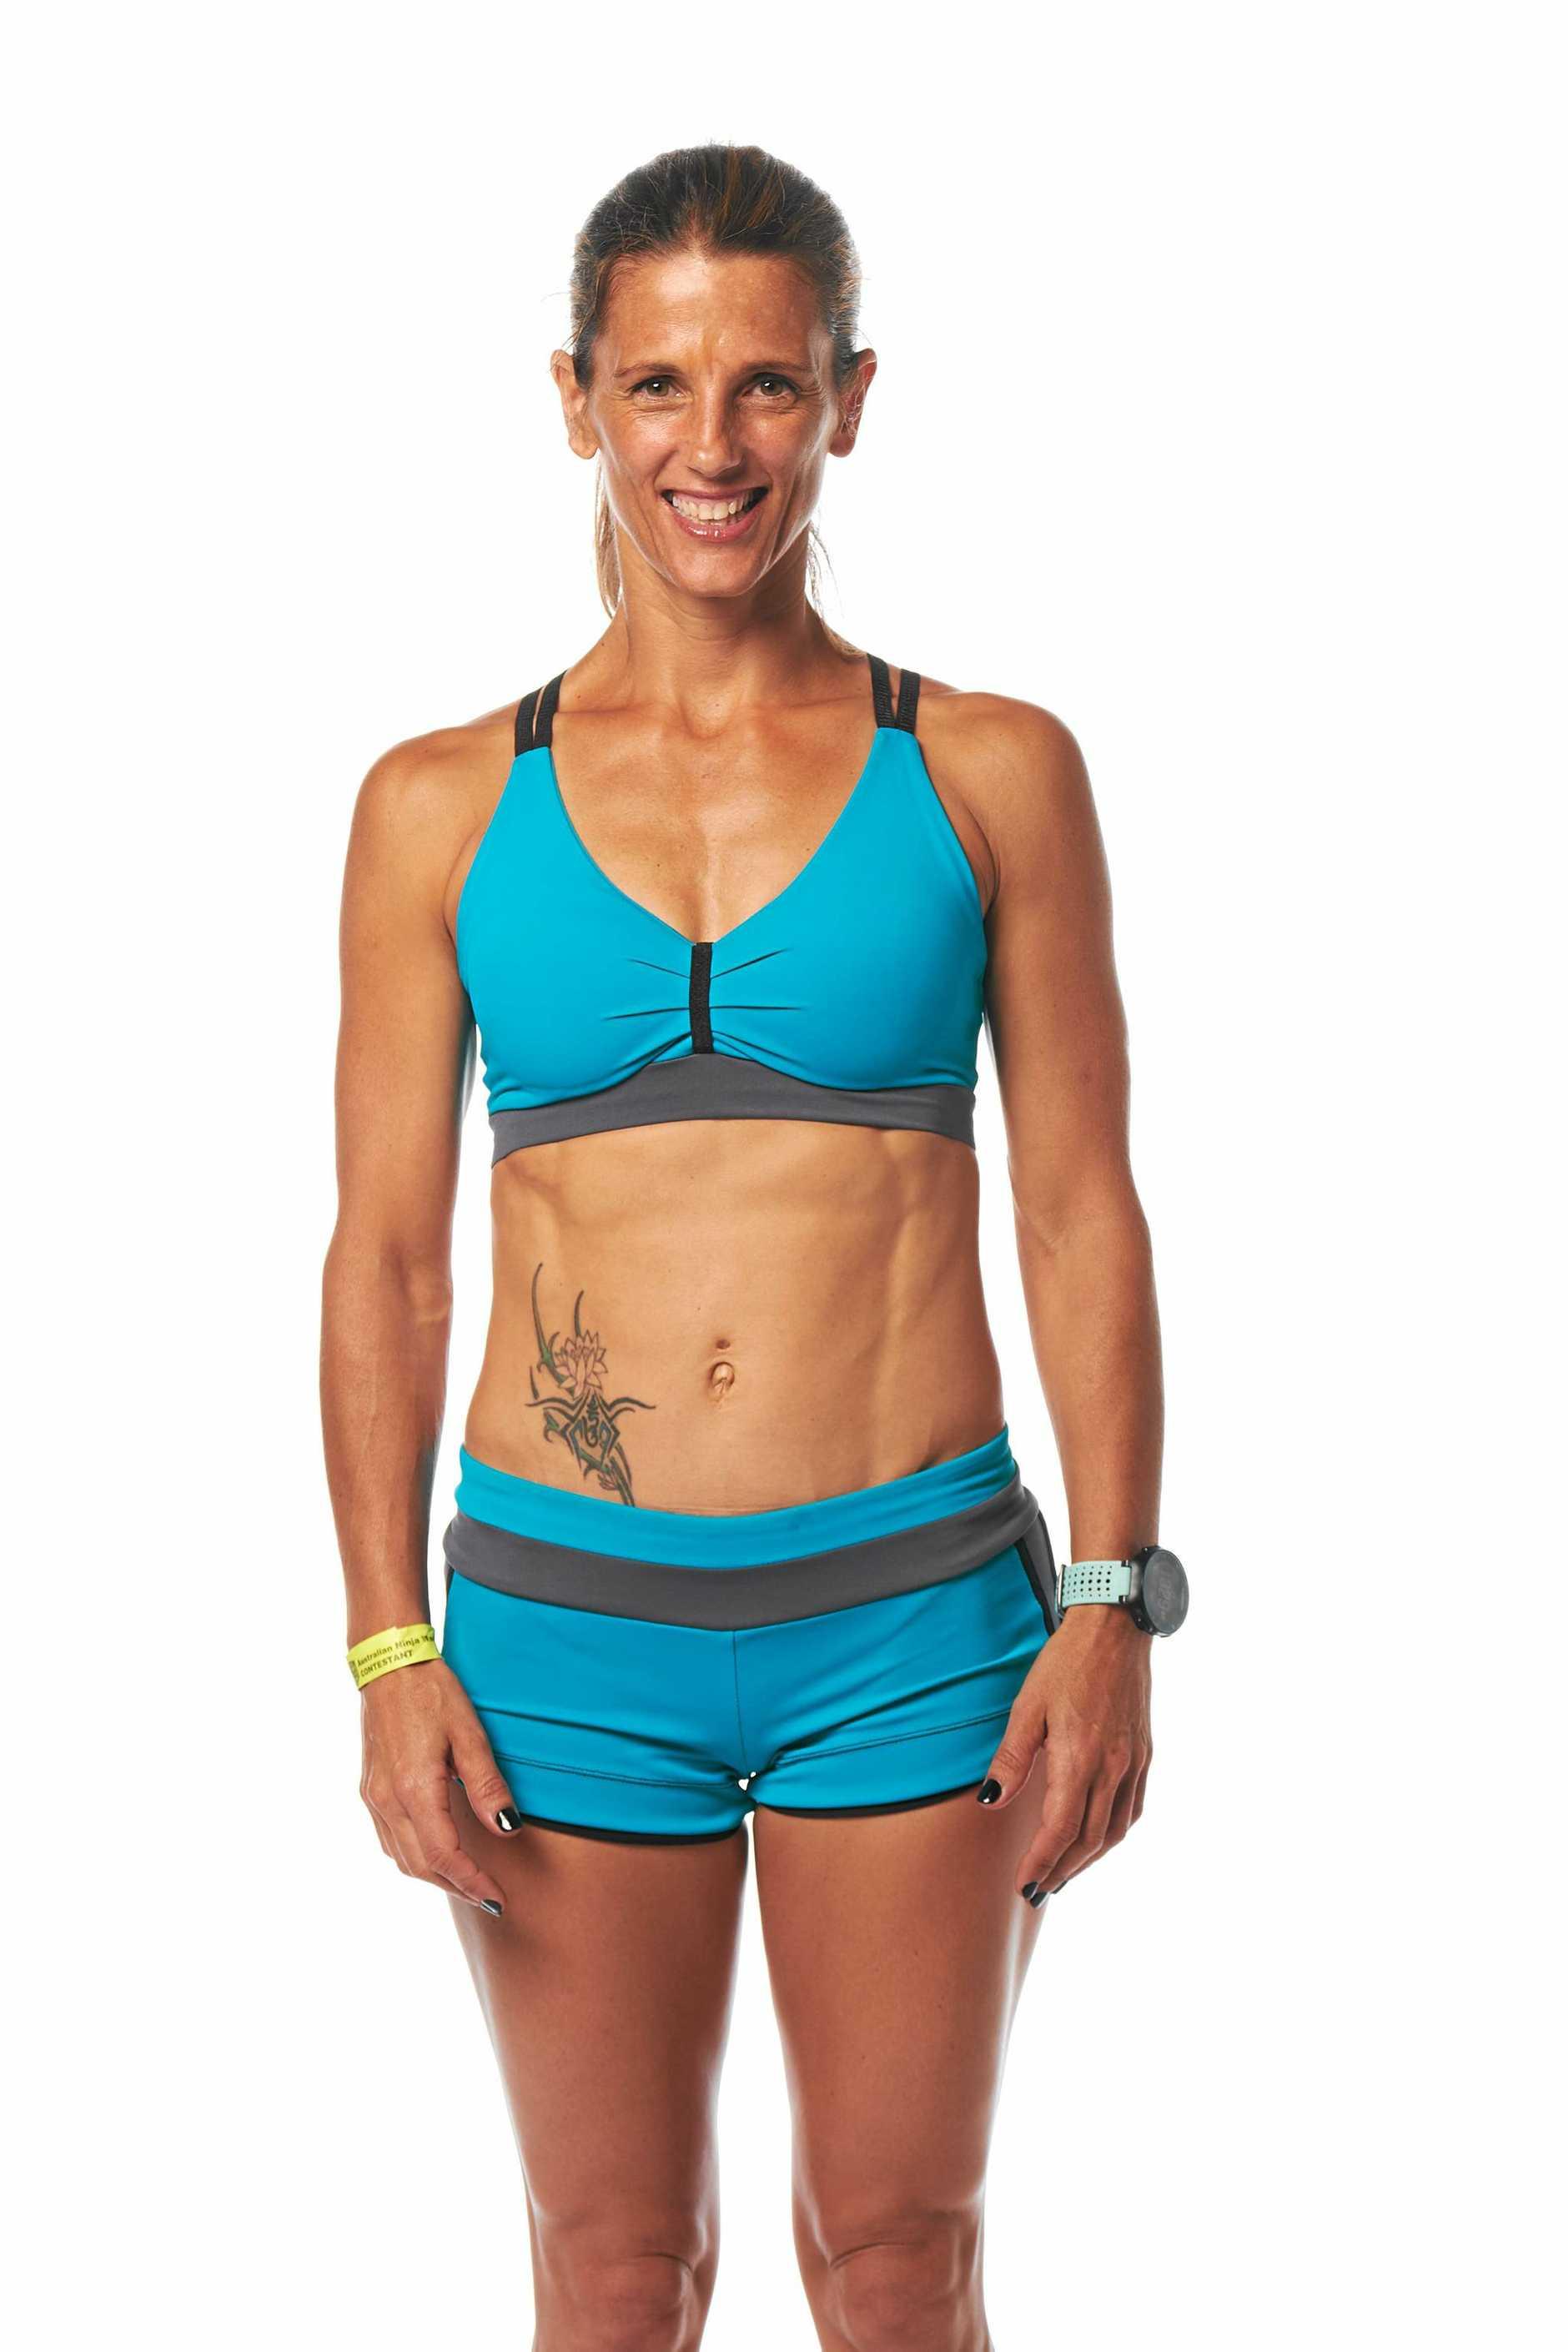 BANGALOW: Upcoming TV Series Ninja Warrior contestant Lisa Parkes.